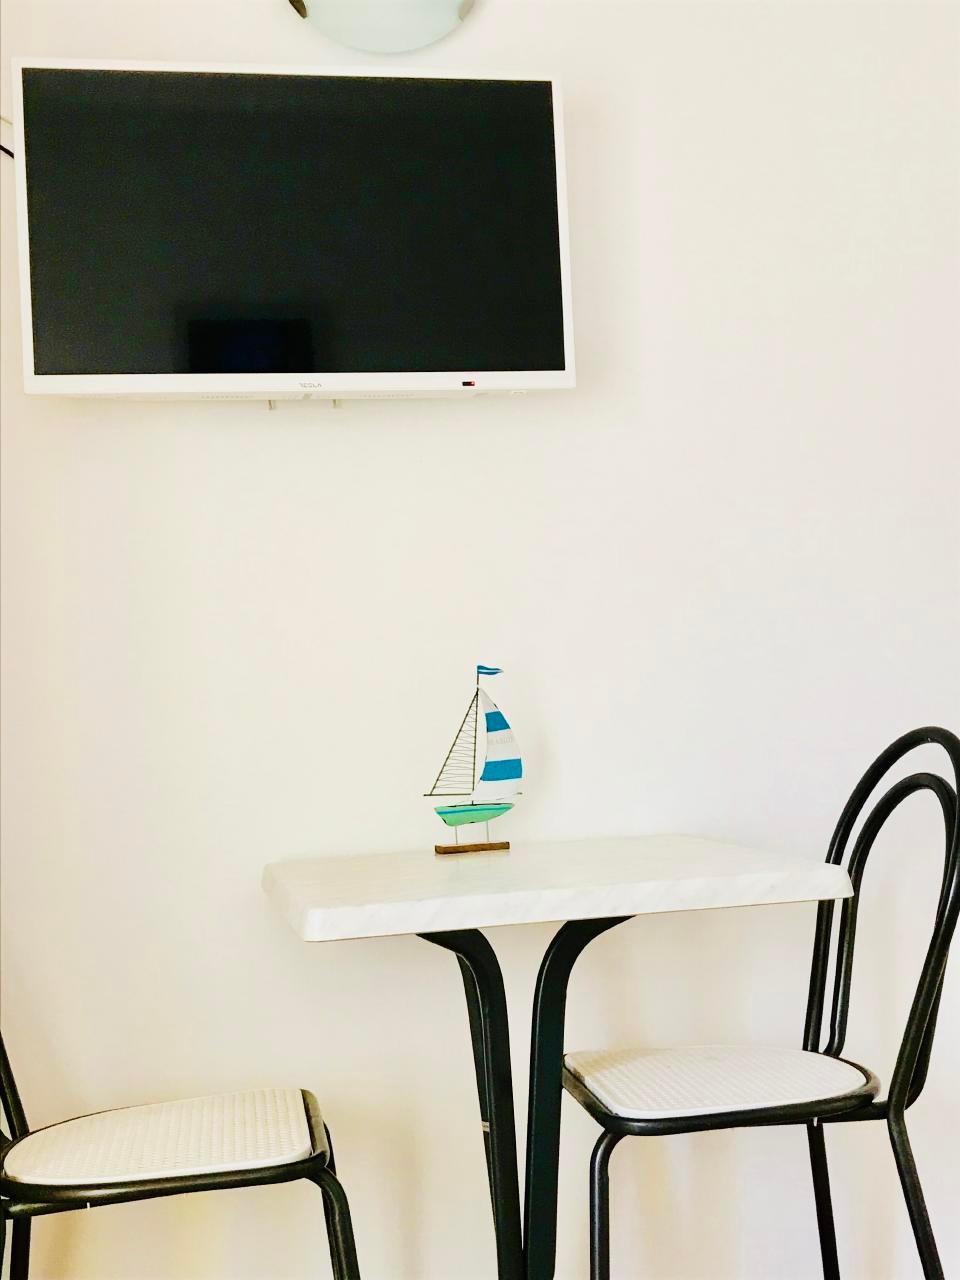 Ferienwohnung Apartmenthaus Ruza 4 - Studio (98392), Kaštel Štafilić, , Dalmatien, Kroatien, Bild 9